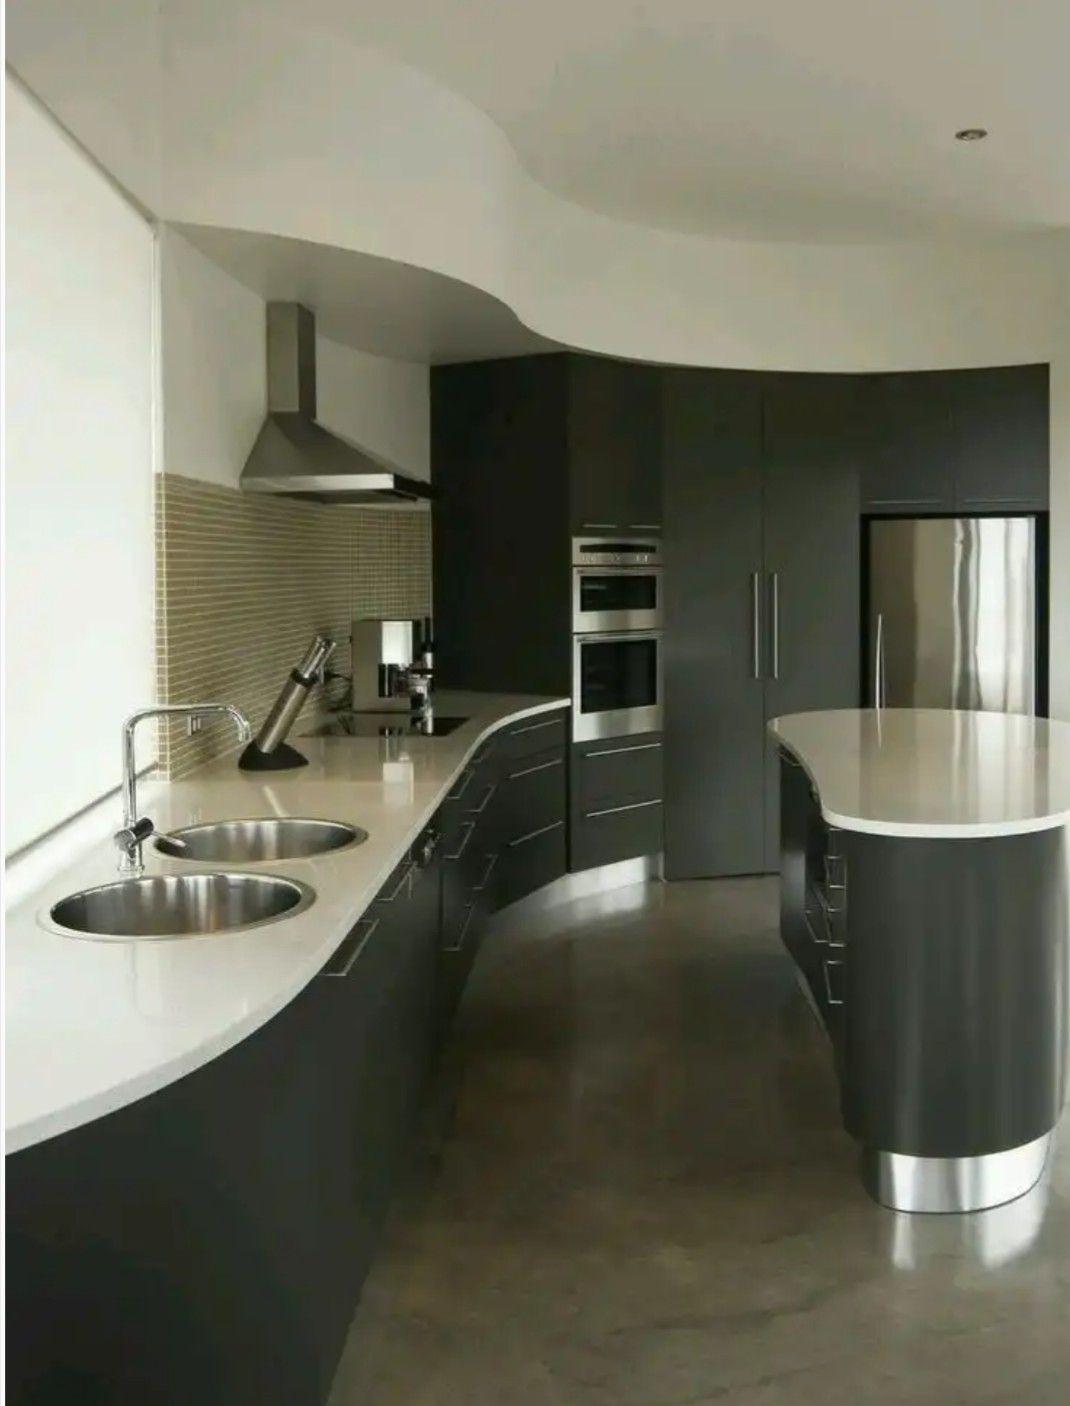 Slab kitchen cabinets  Pin by Lizeth Escobar on como aprovechar cocinas pequeñas  Pinterest